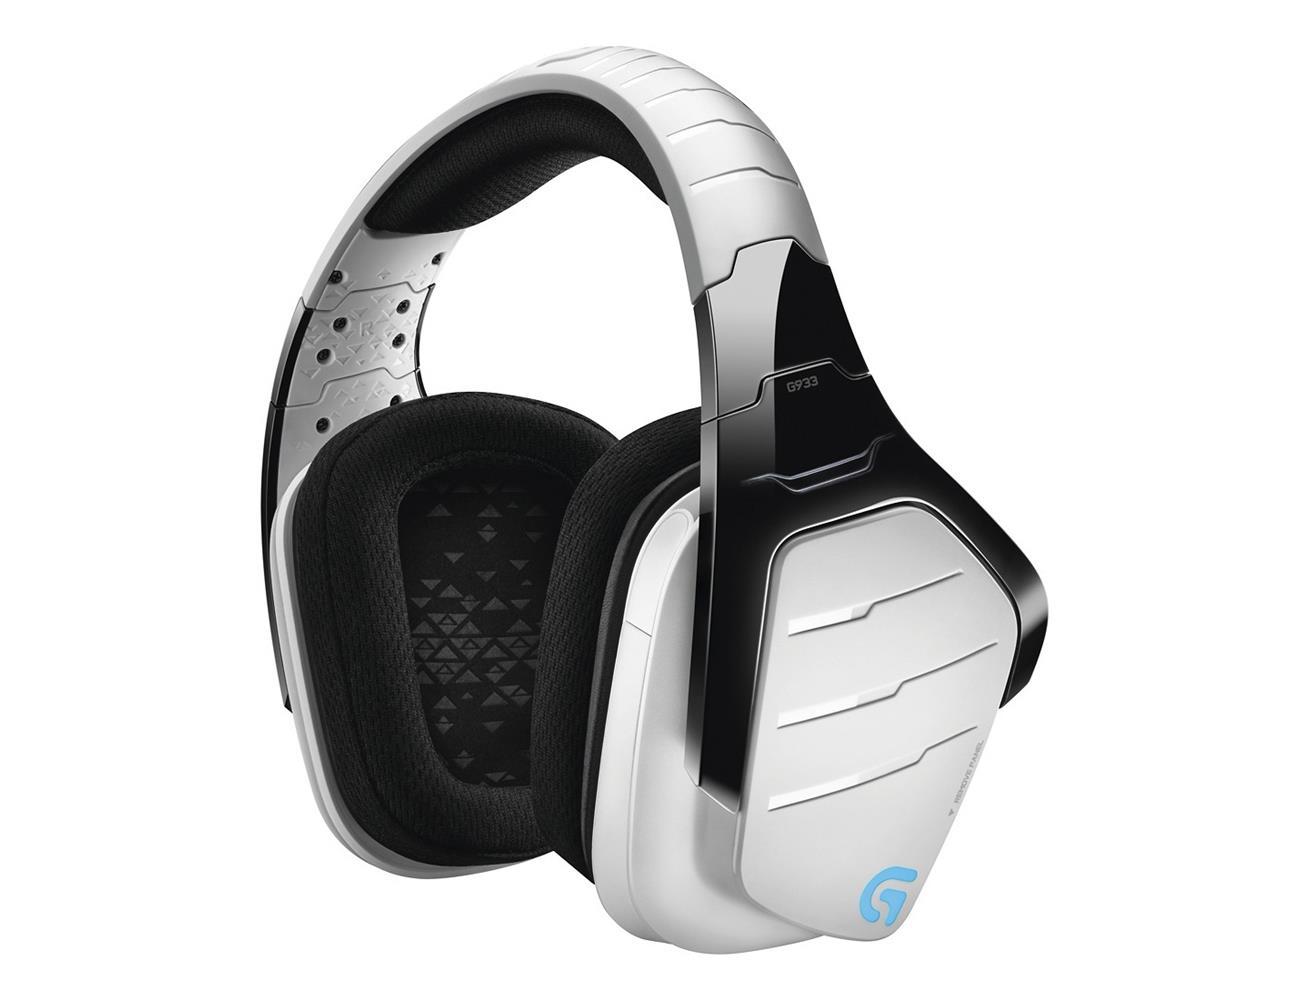 ade10c0ea2f Logitech Wireless Gaming Headset G933 Artemis Spectrum 7.1 Surround - White  ...